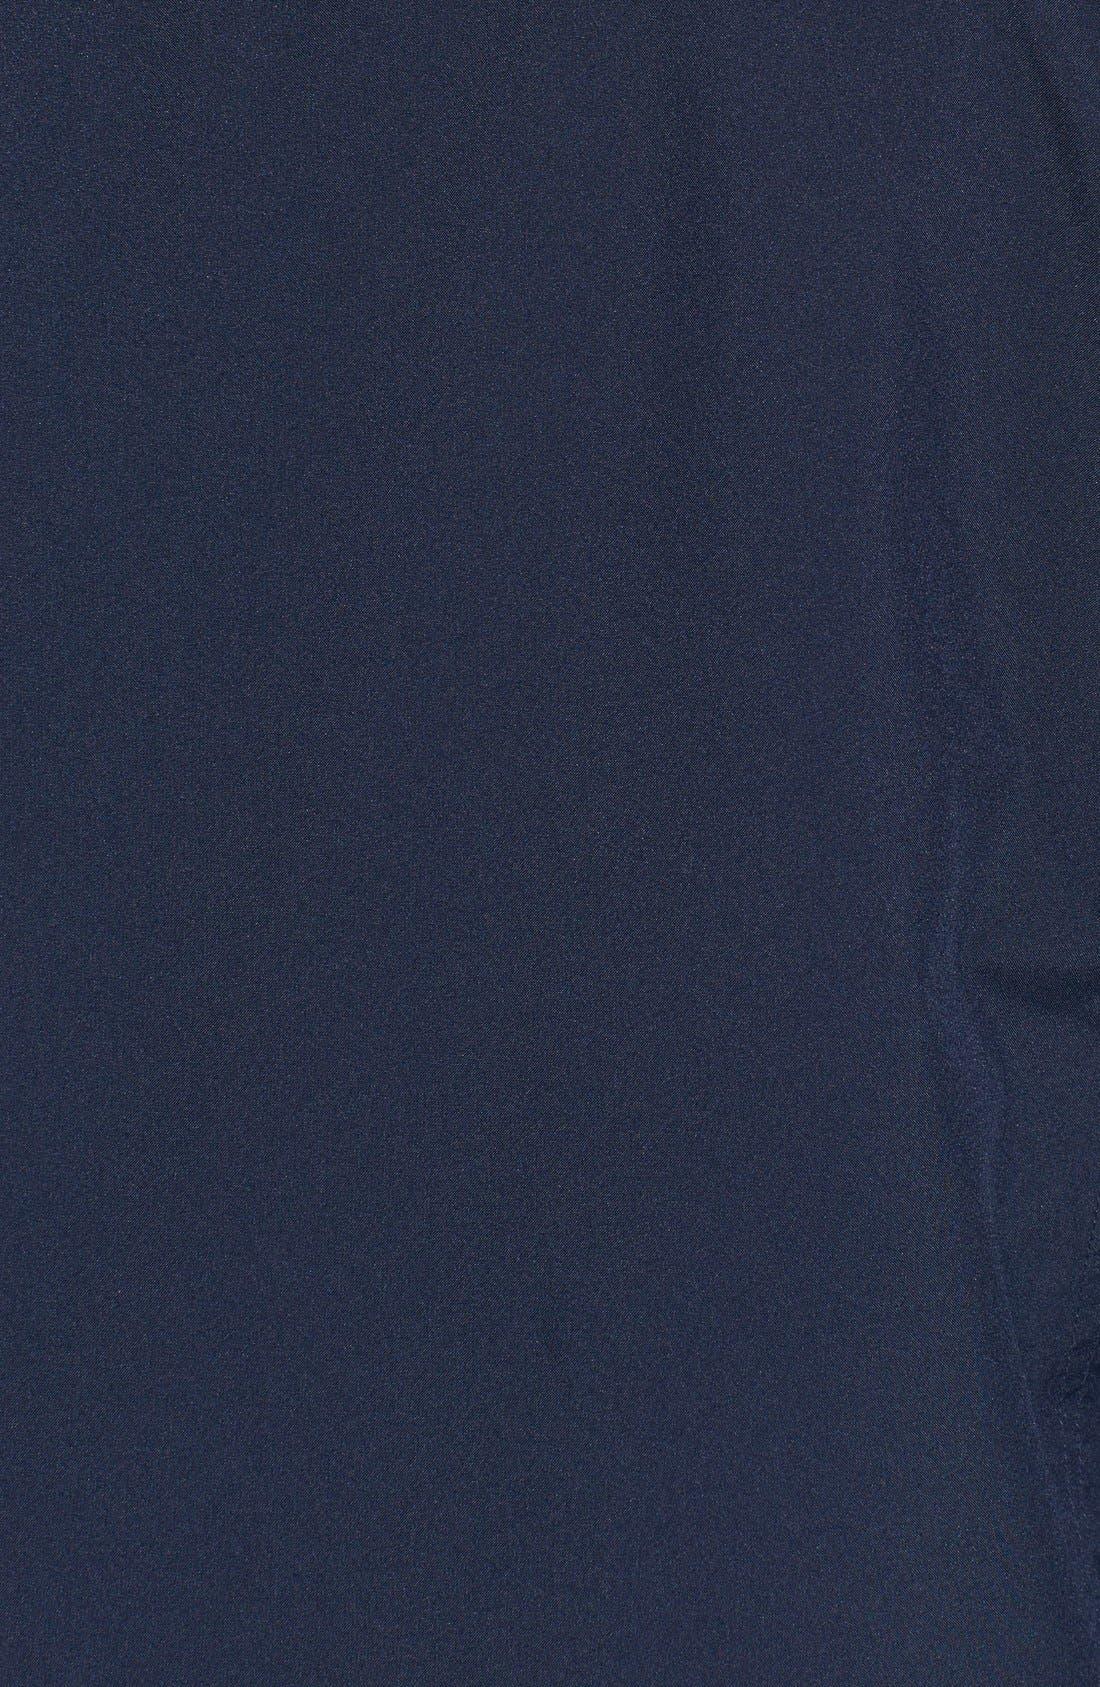 WeatherTec Sanders Jacket,                             Alternate thumbnail 3, color,                             420